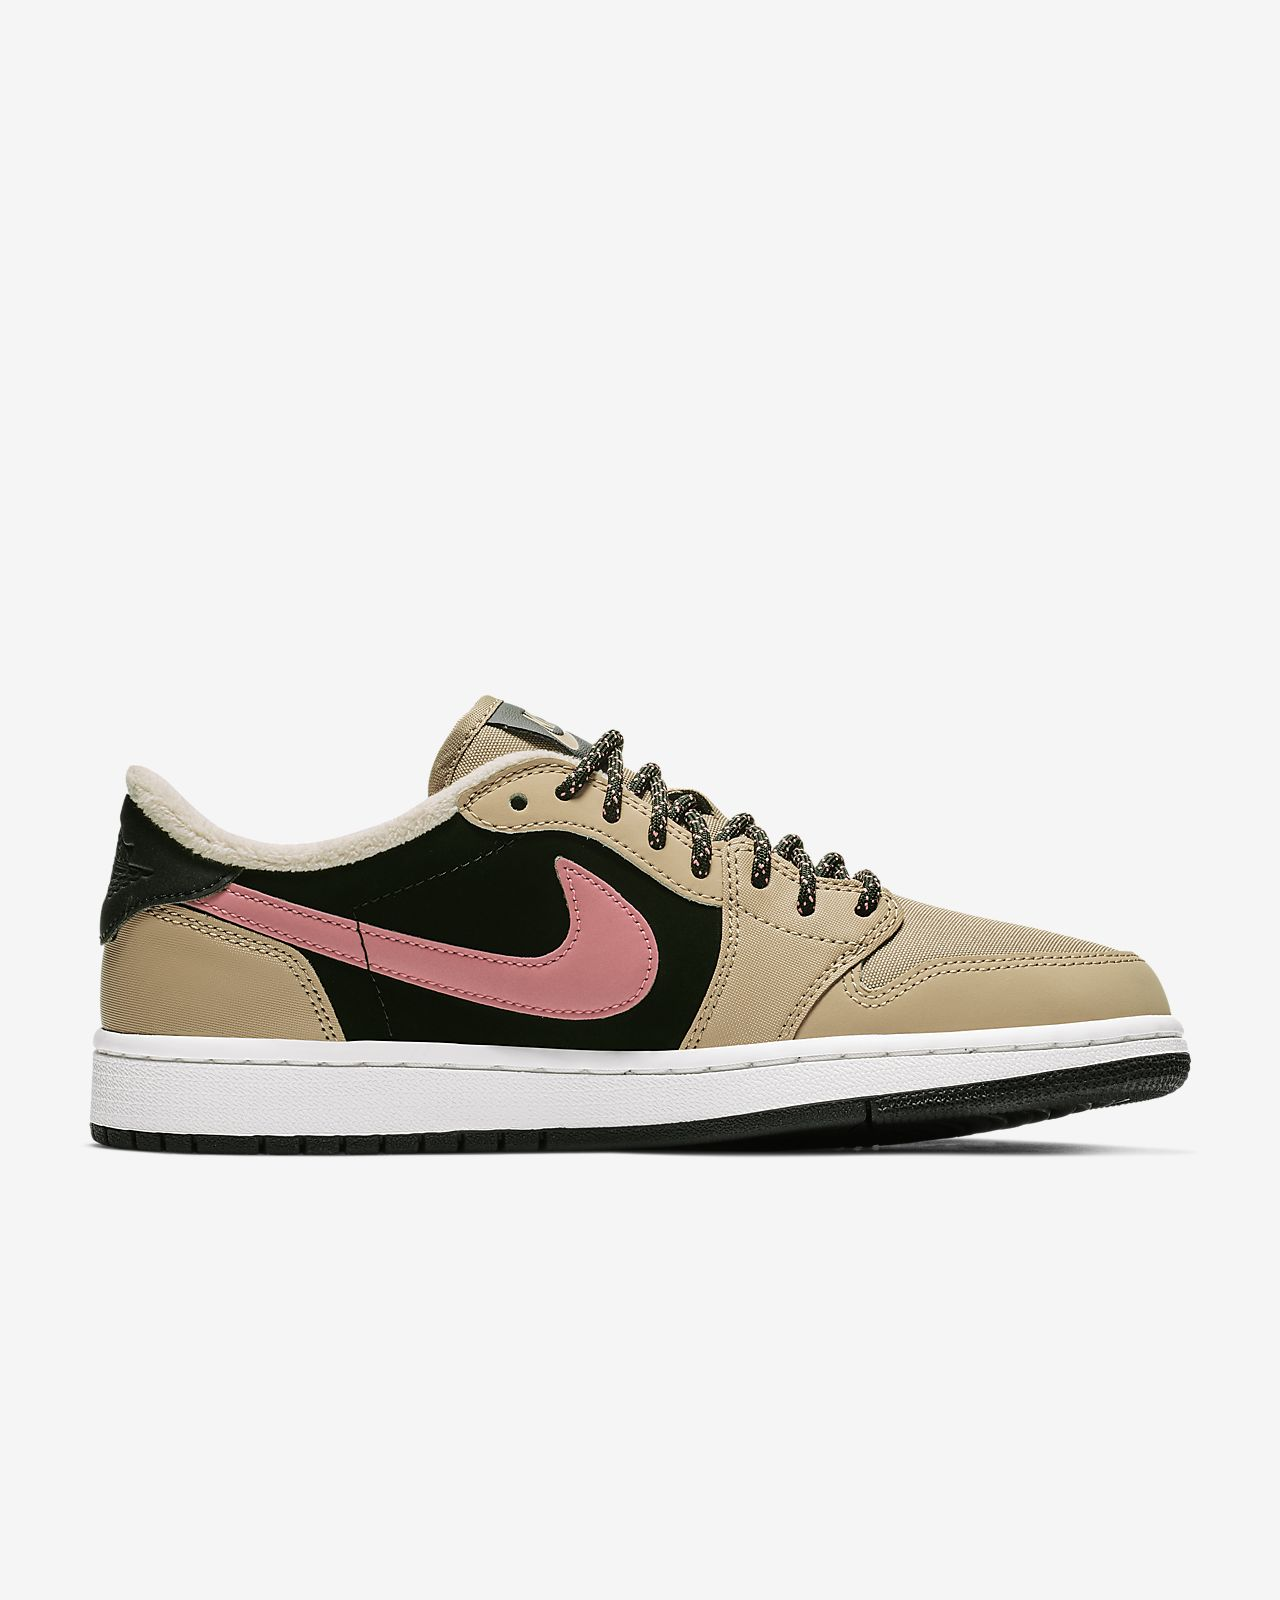 0d7b3d5c71aac5 Air Jordan 1 Retro Low OG Women s Shoe. Nike.com